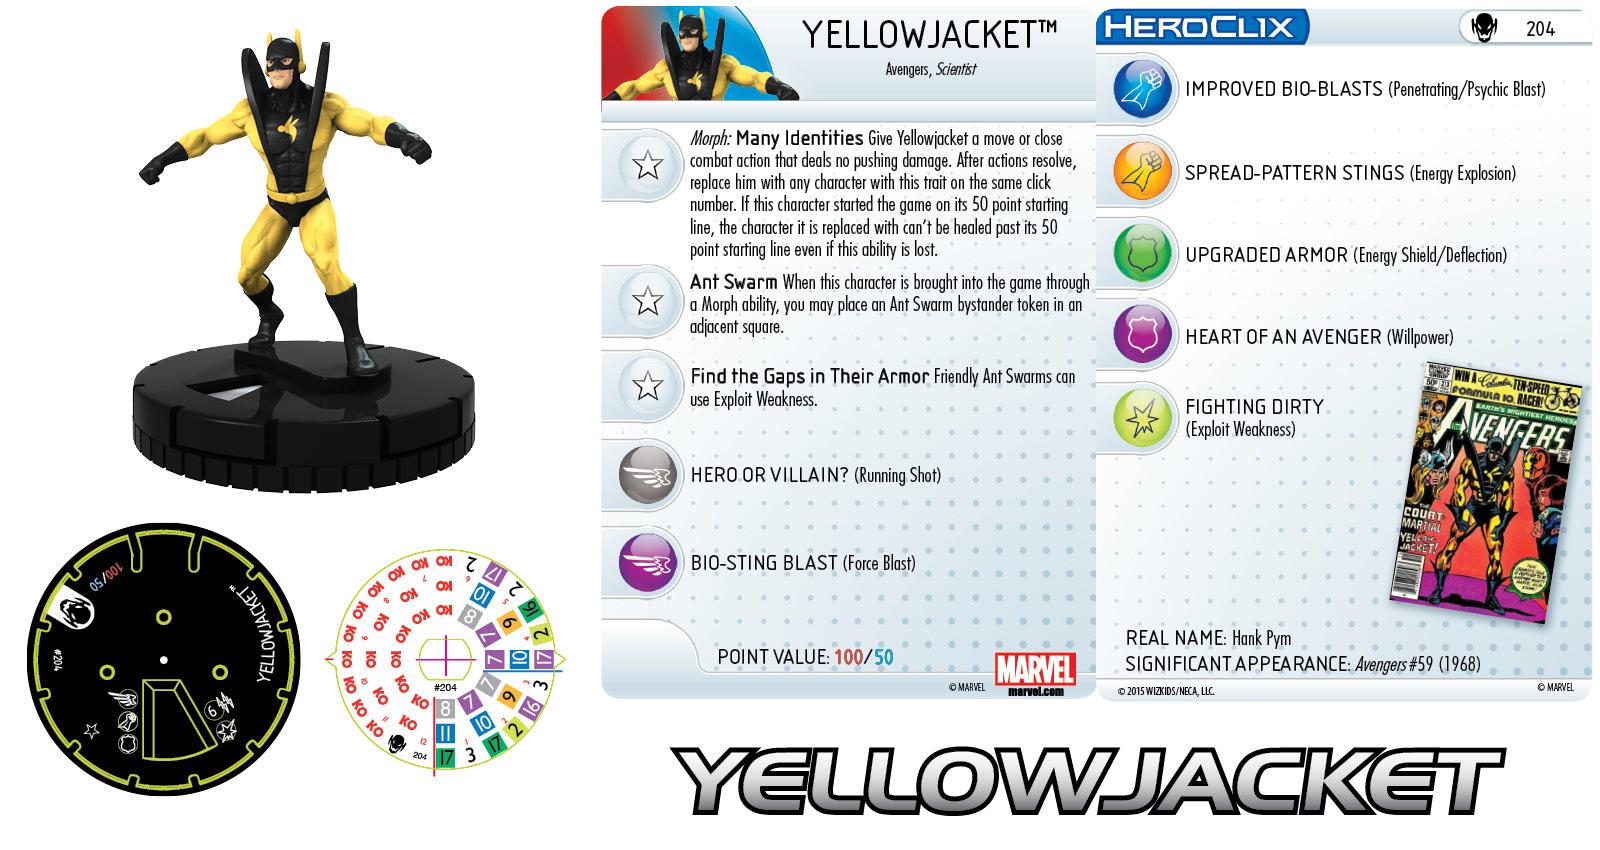 Marvel HeroClix: Age of Ultron- Yellowjacket